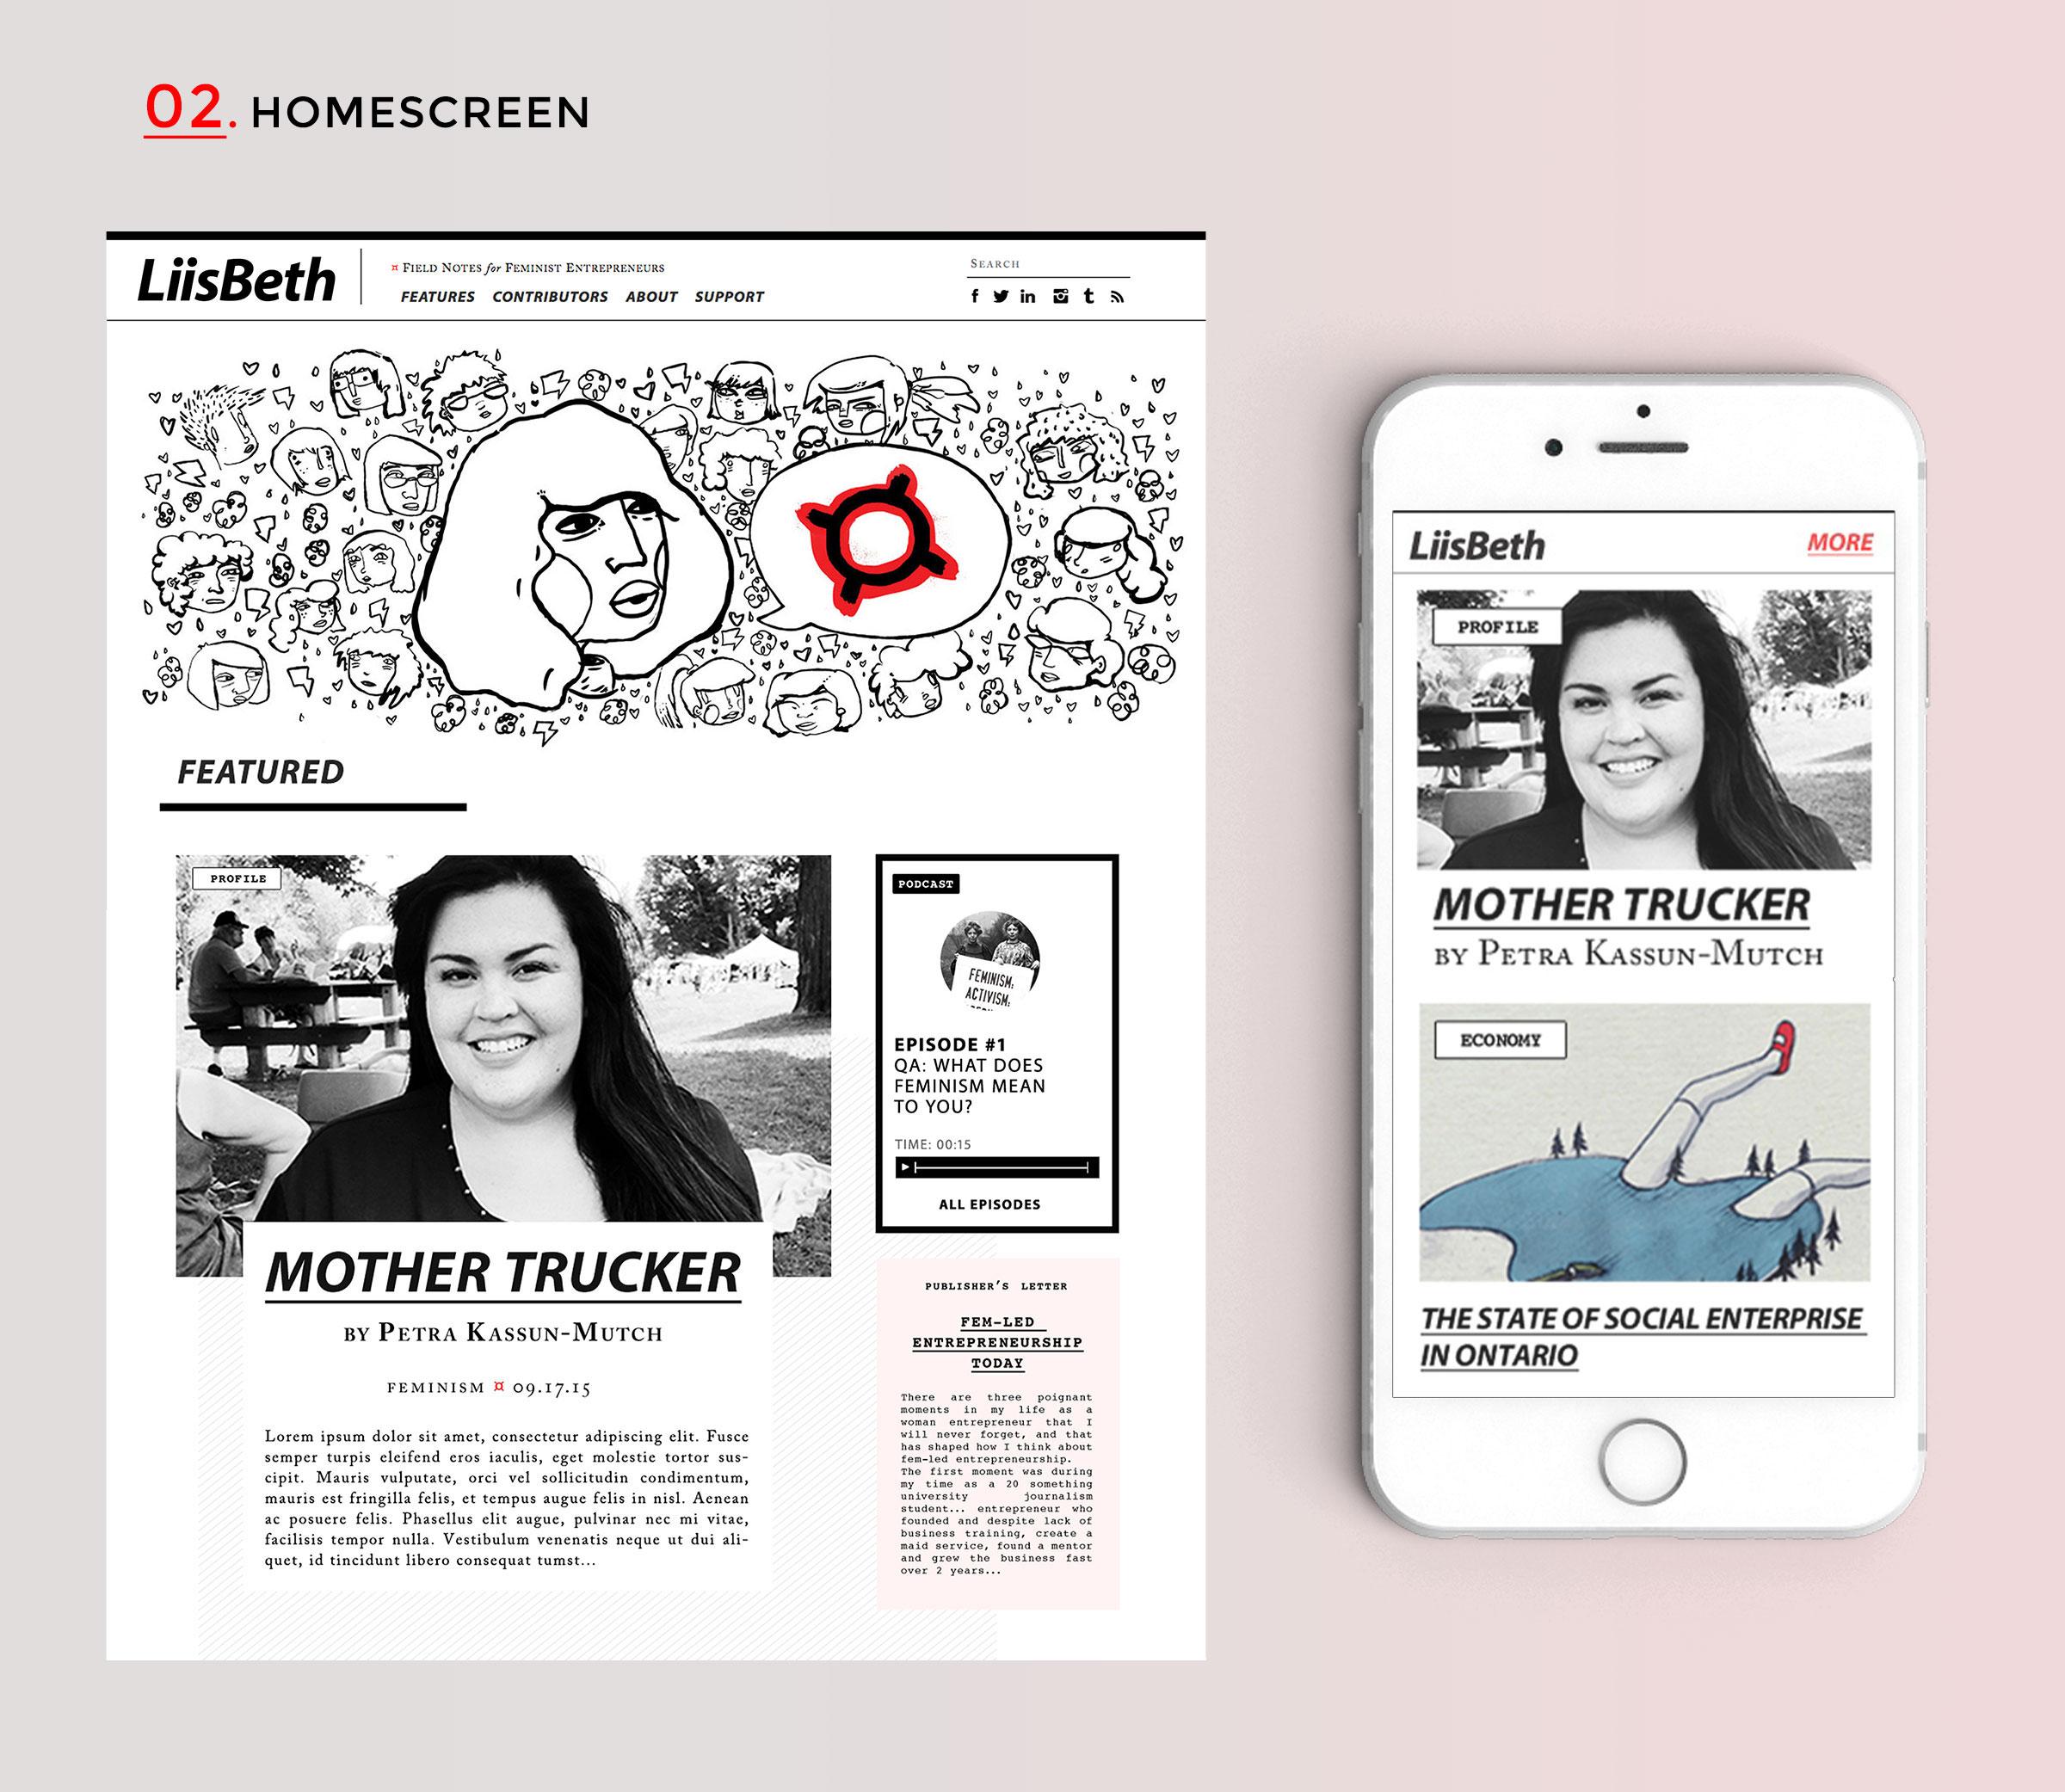 feminist-business-webzine-wordpress-theme-homescreen-website-design